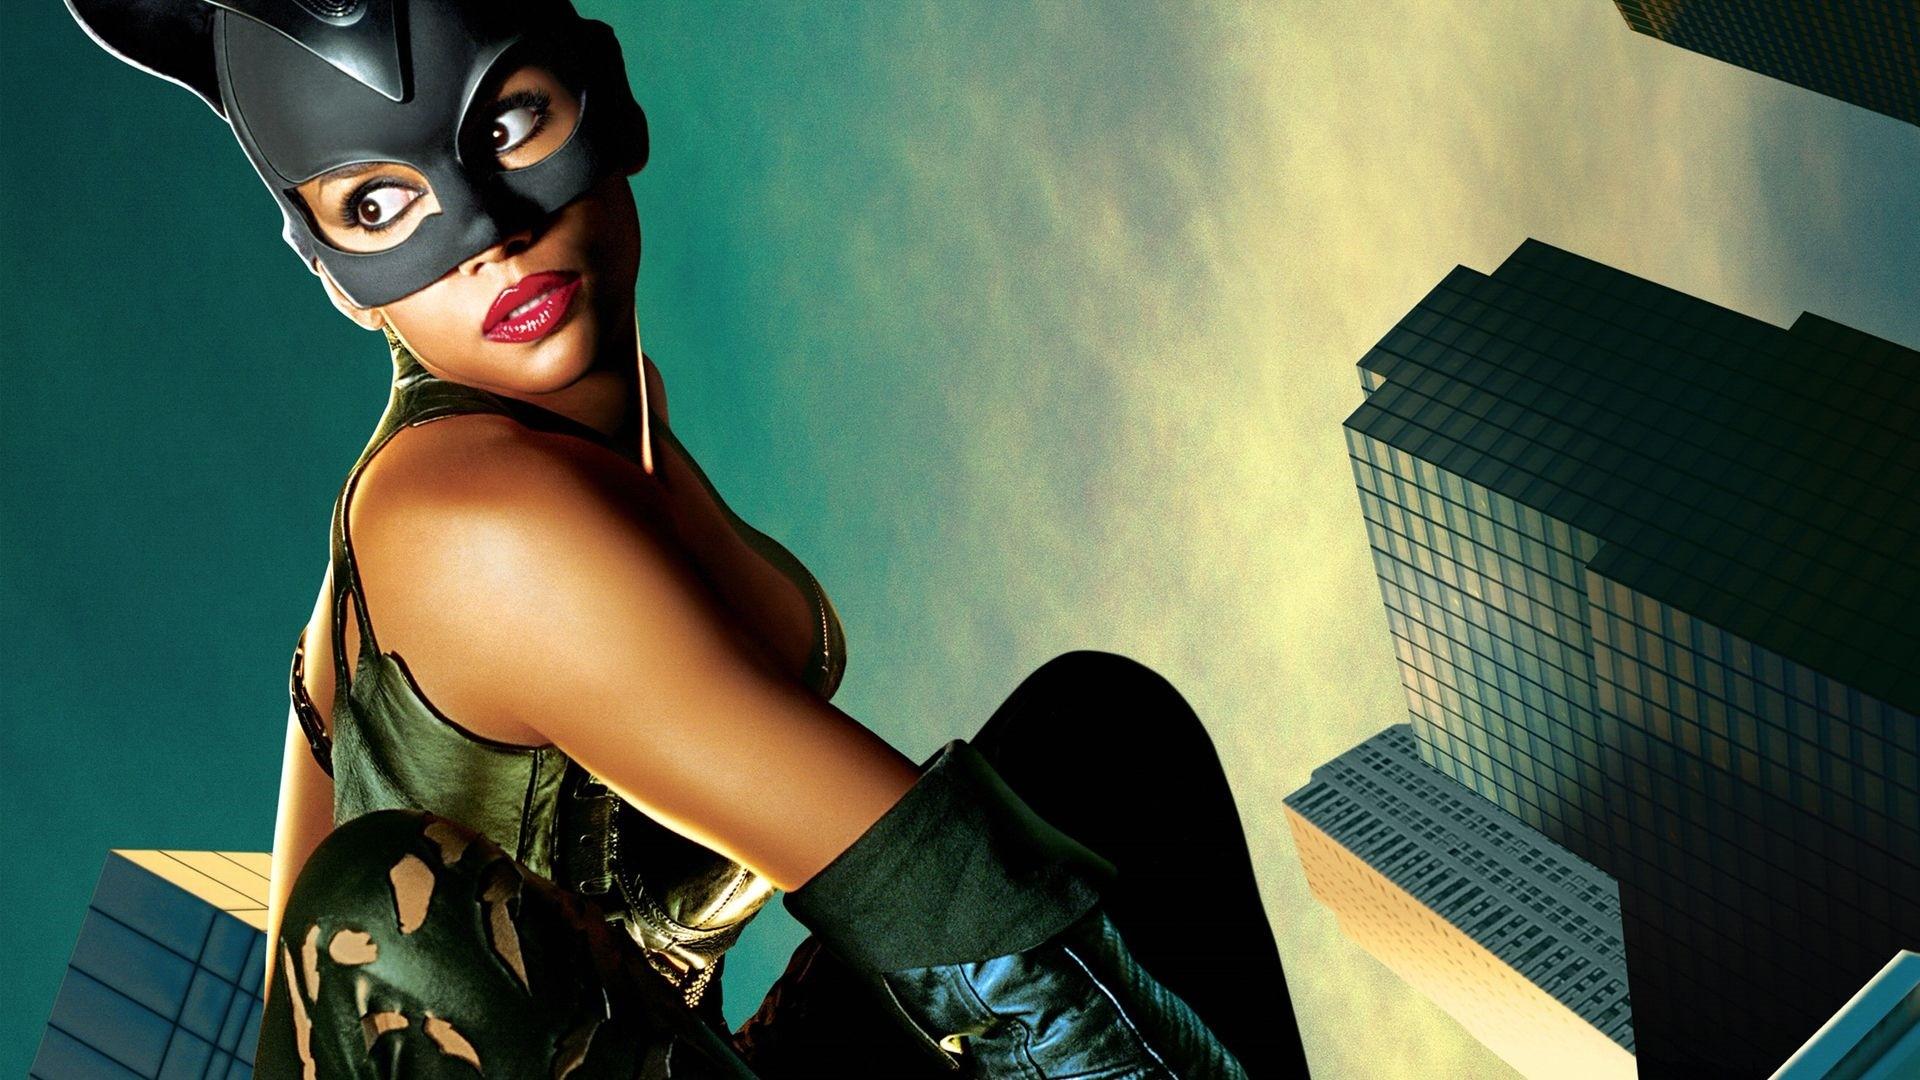 Catwoman Wallpaper 1920x1080